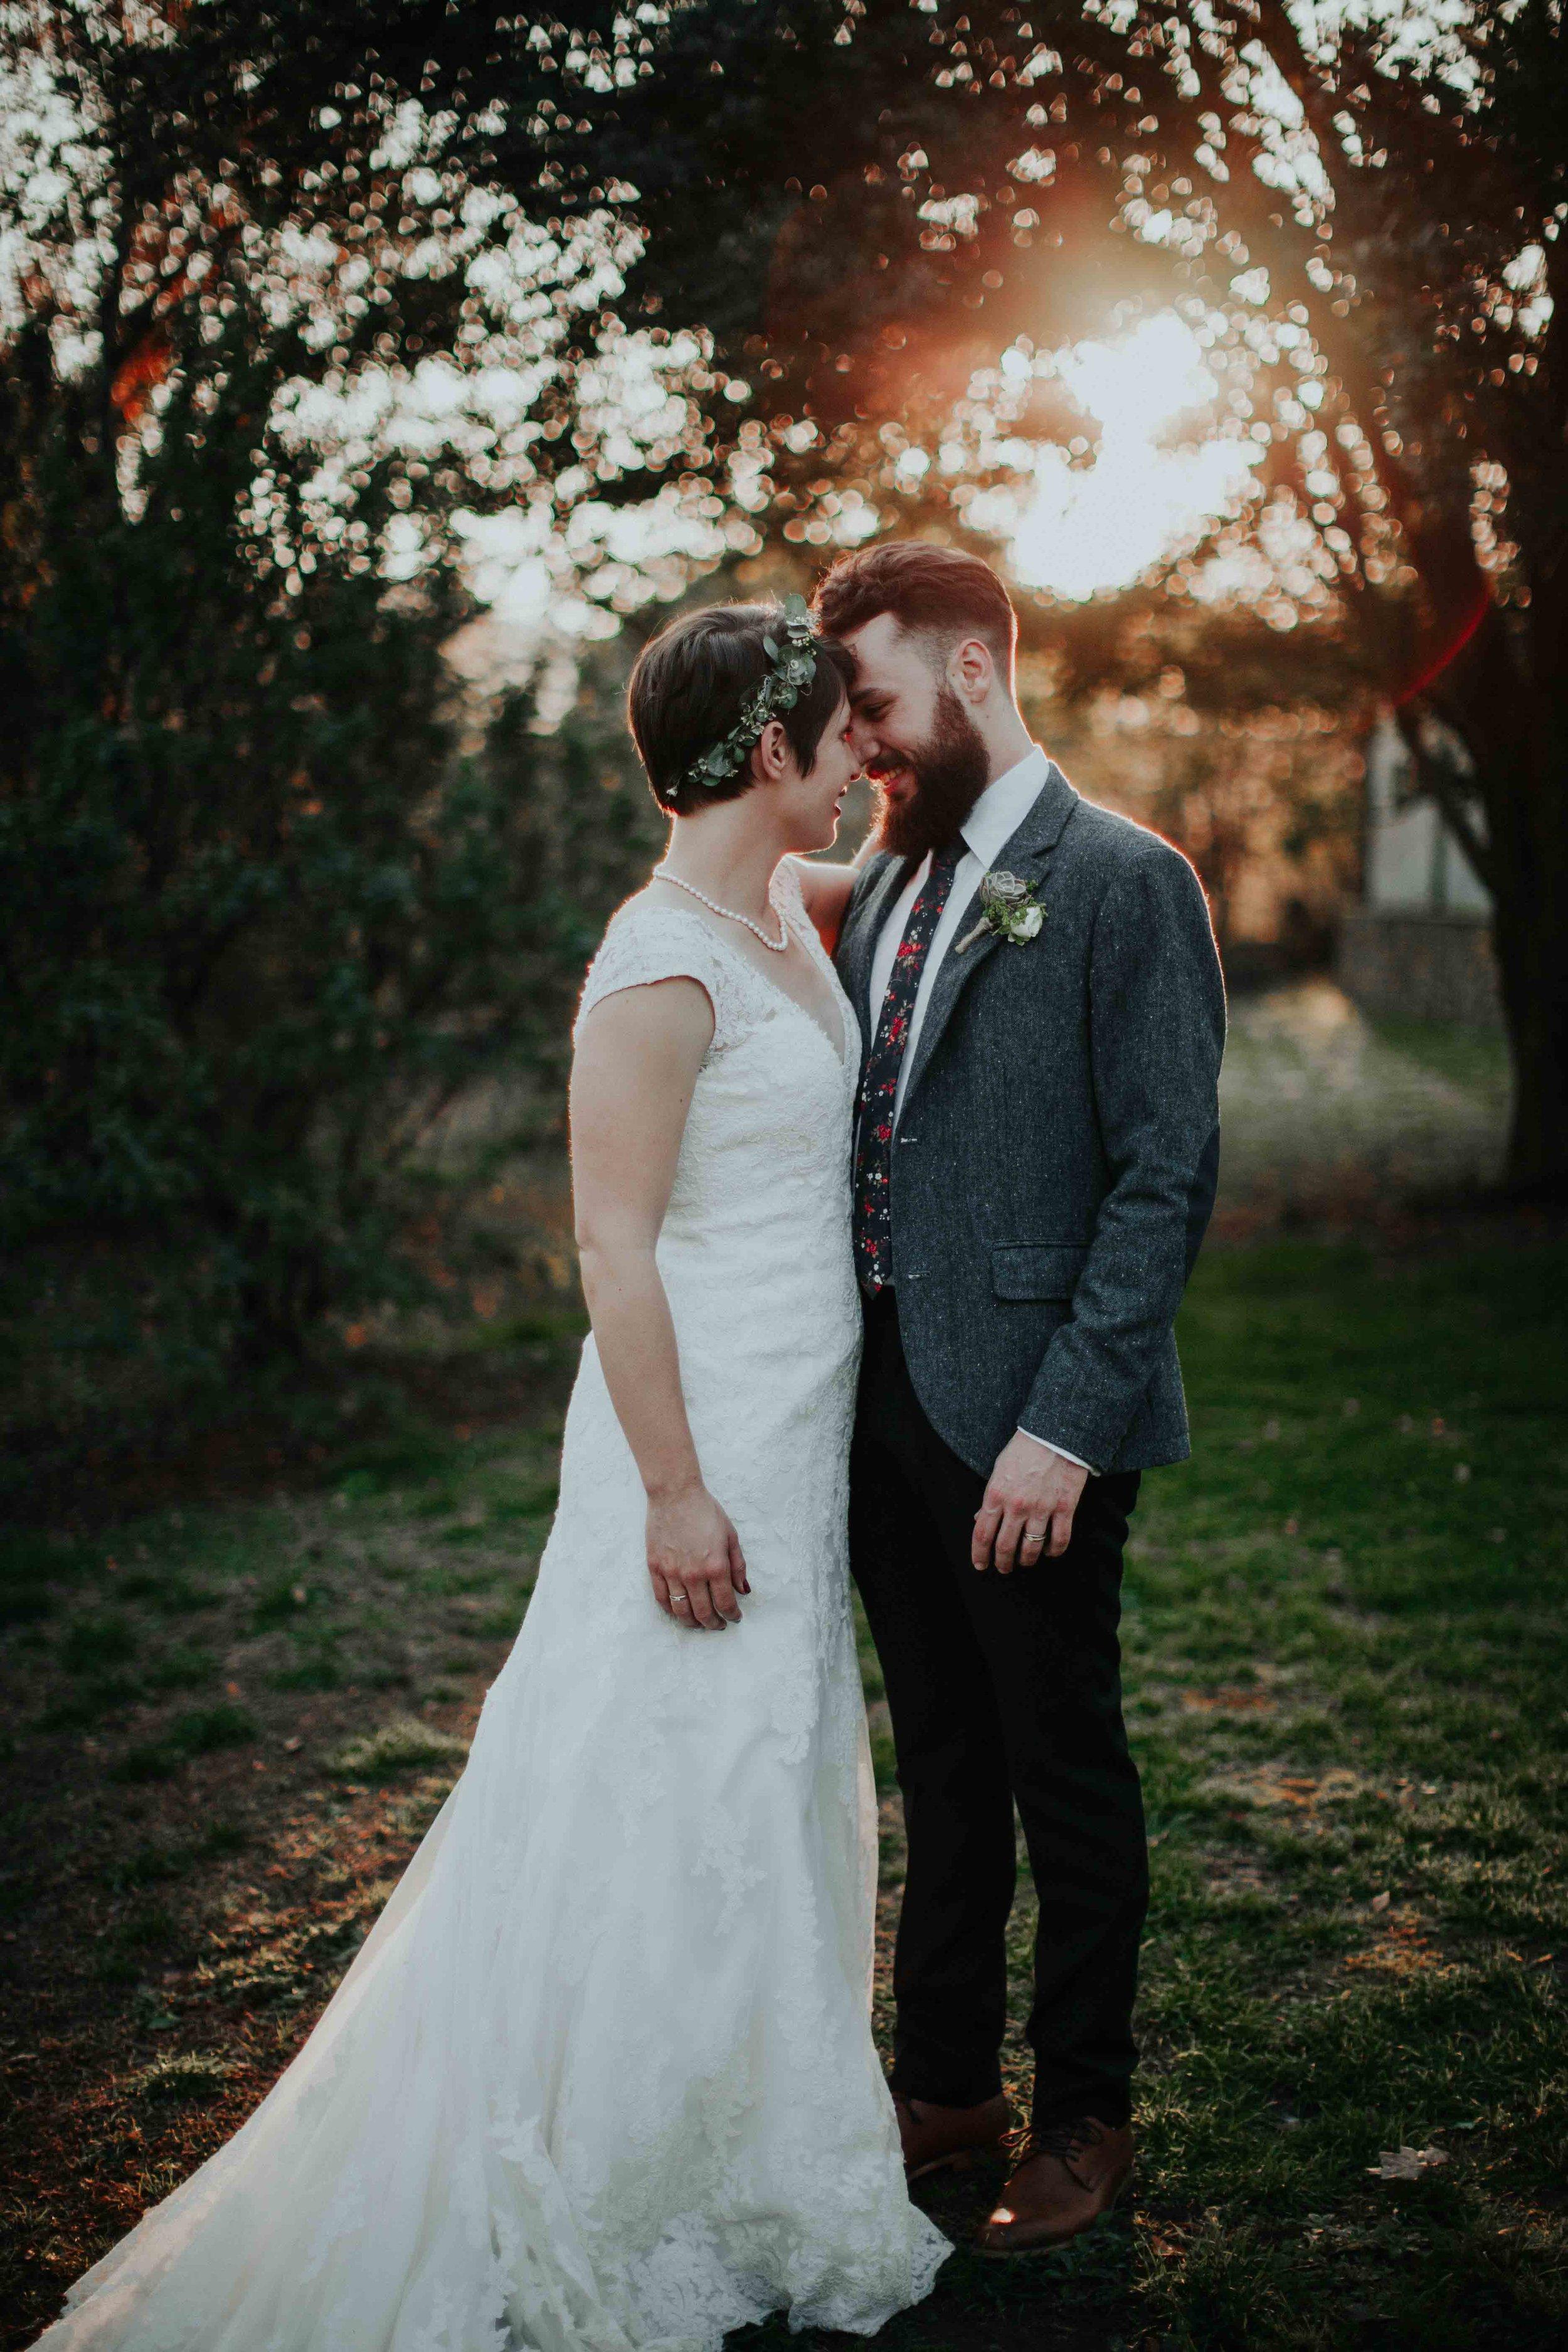 Kristi Smith Photography_Eloff&Jeanette_ Wedding Photographer 24.jpg